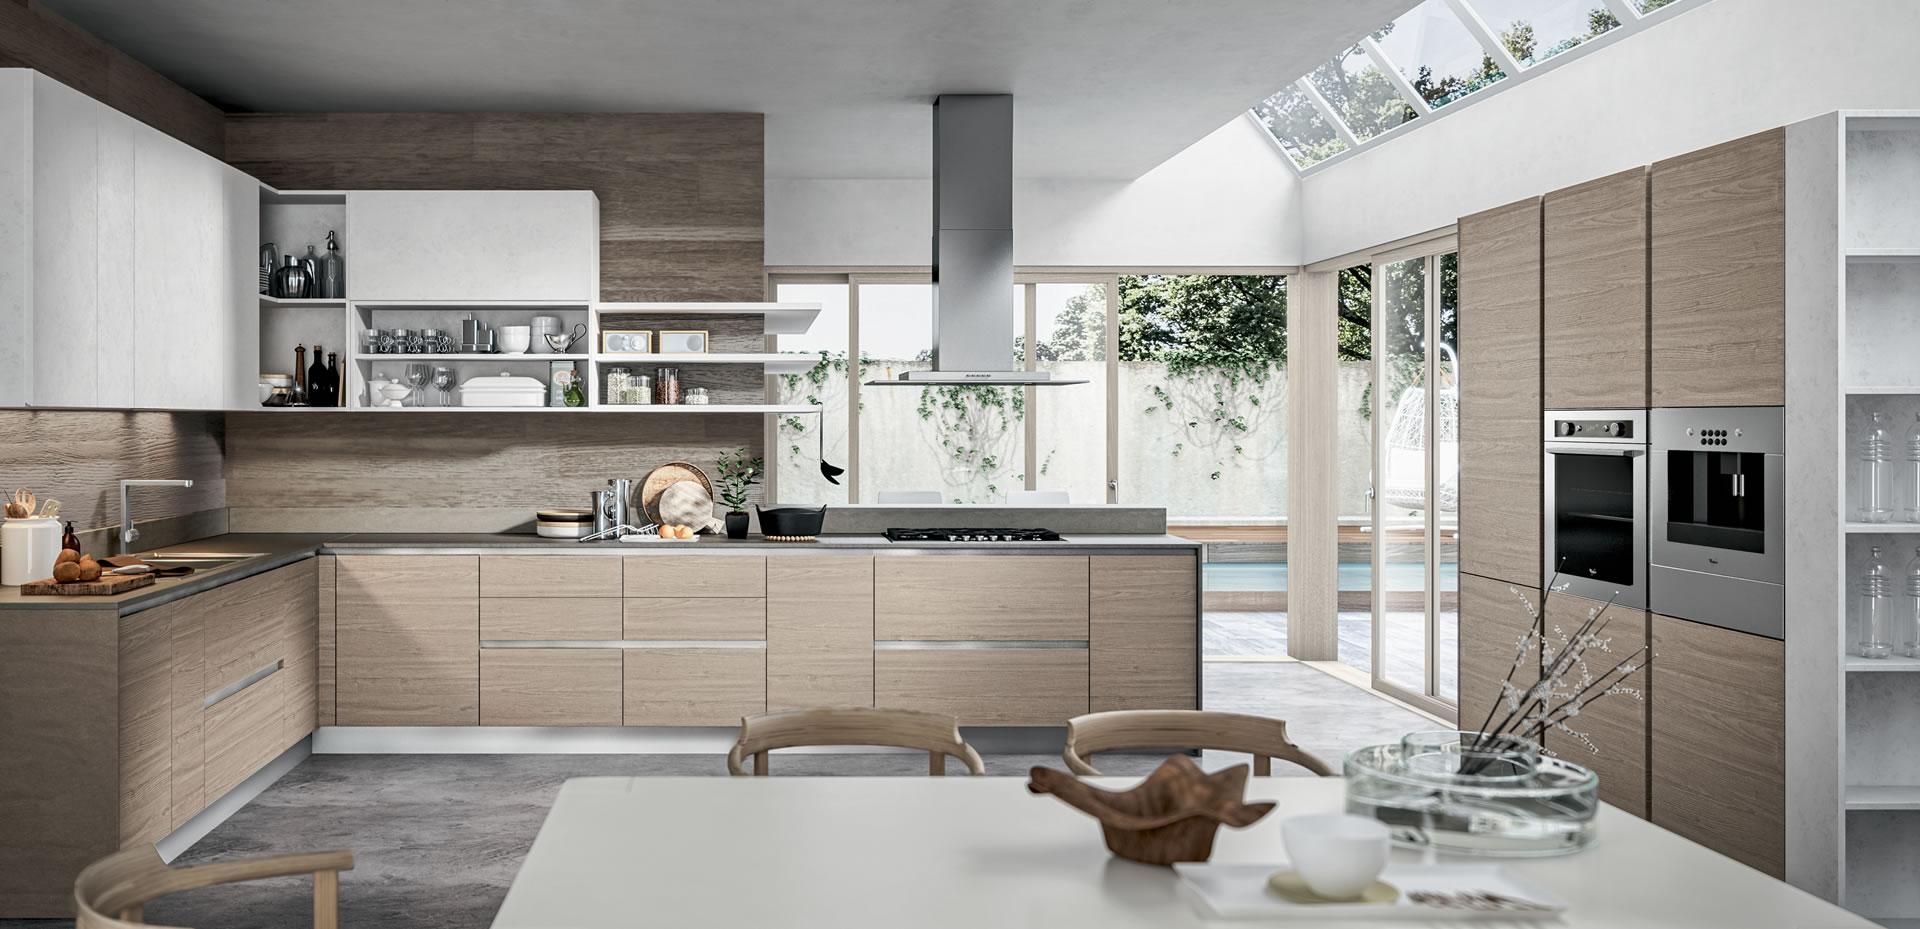 Moderne kuhinje v studiu kuhinj gros novak for Arredamenti ad